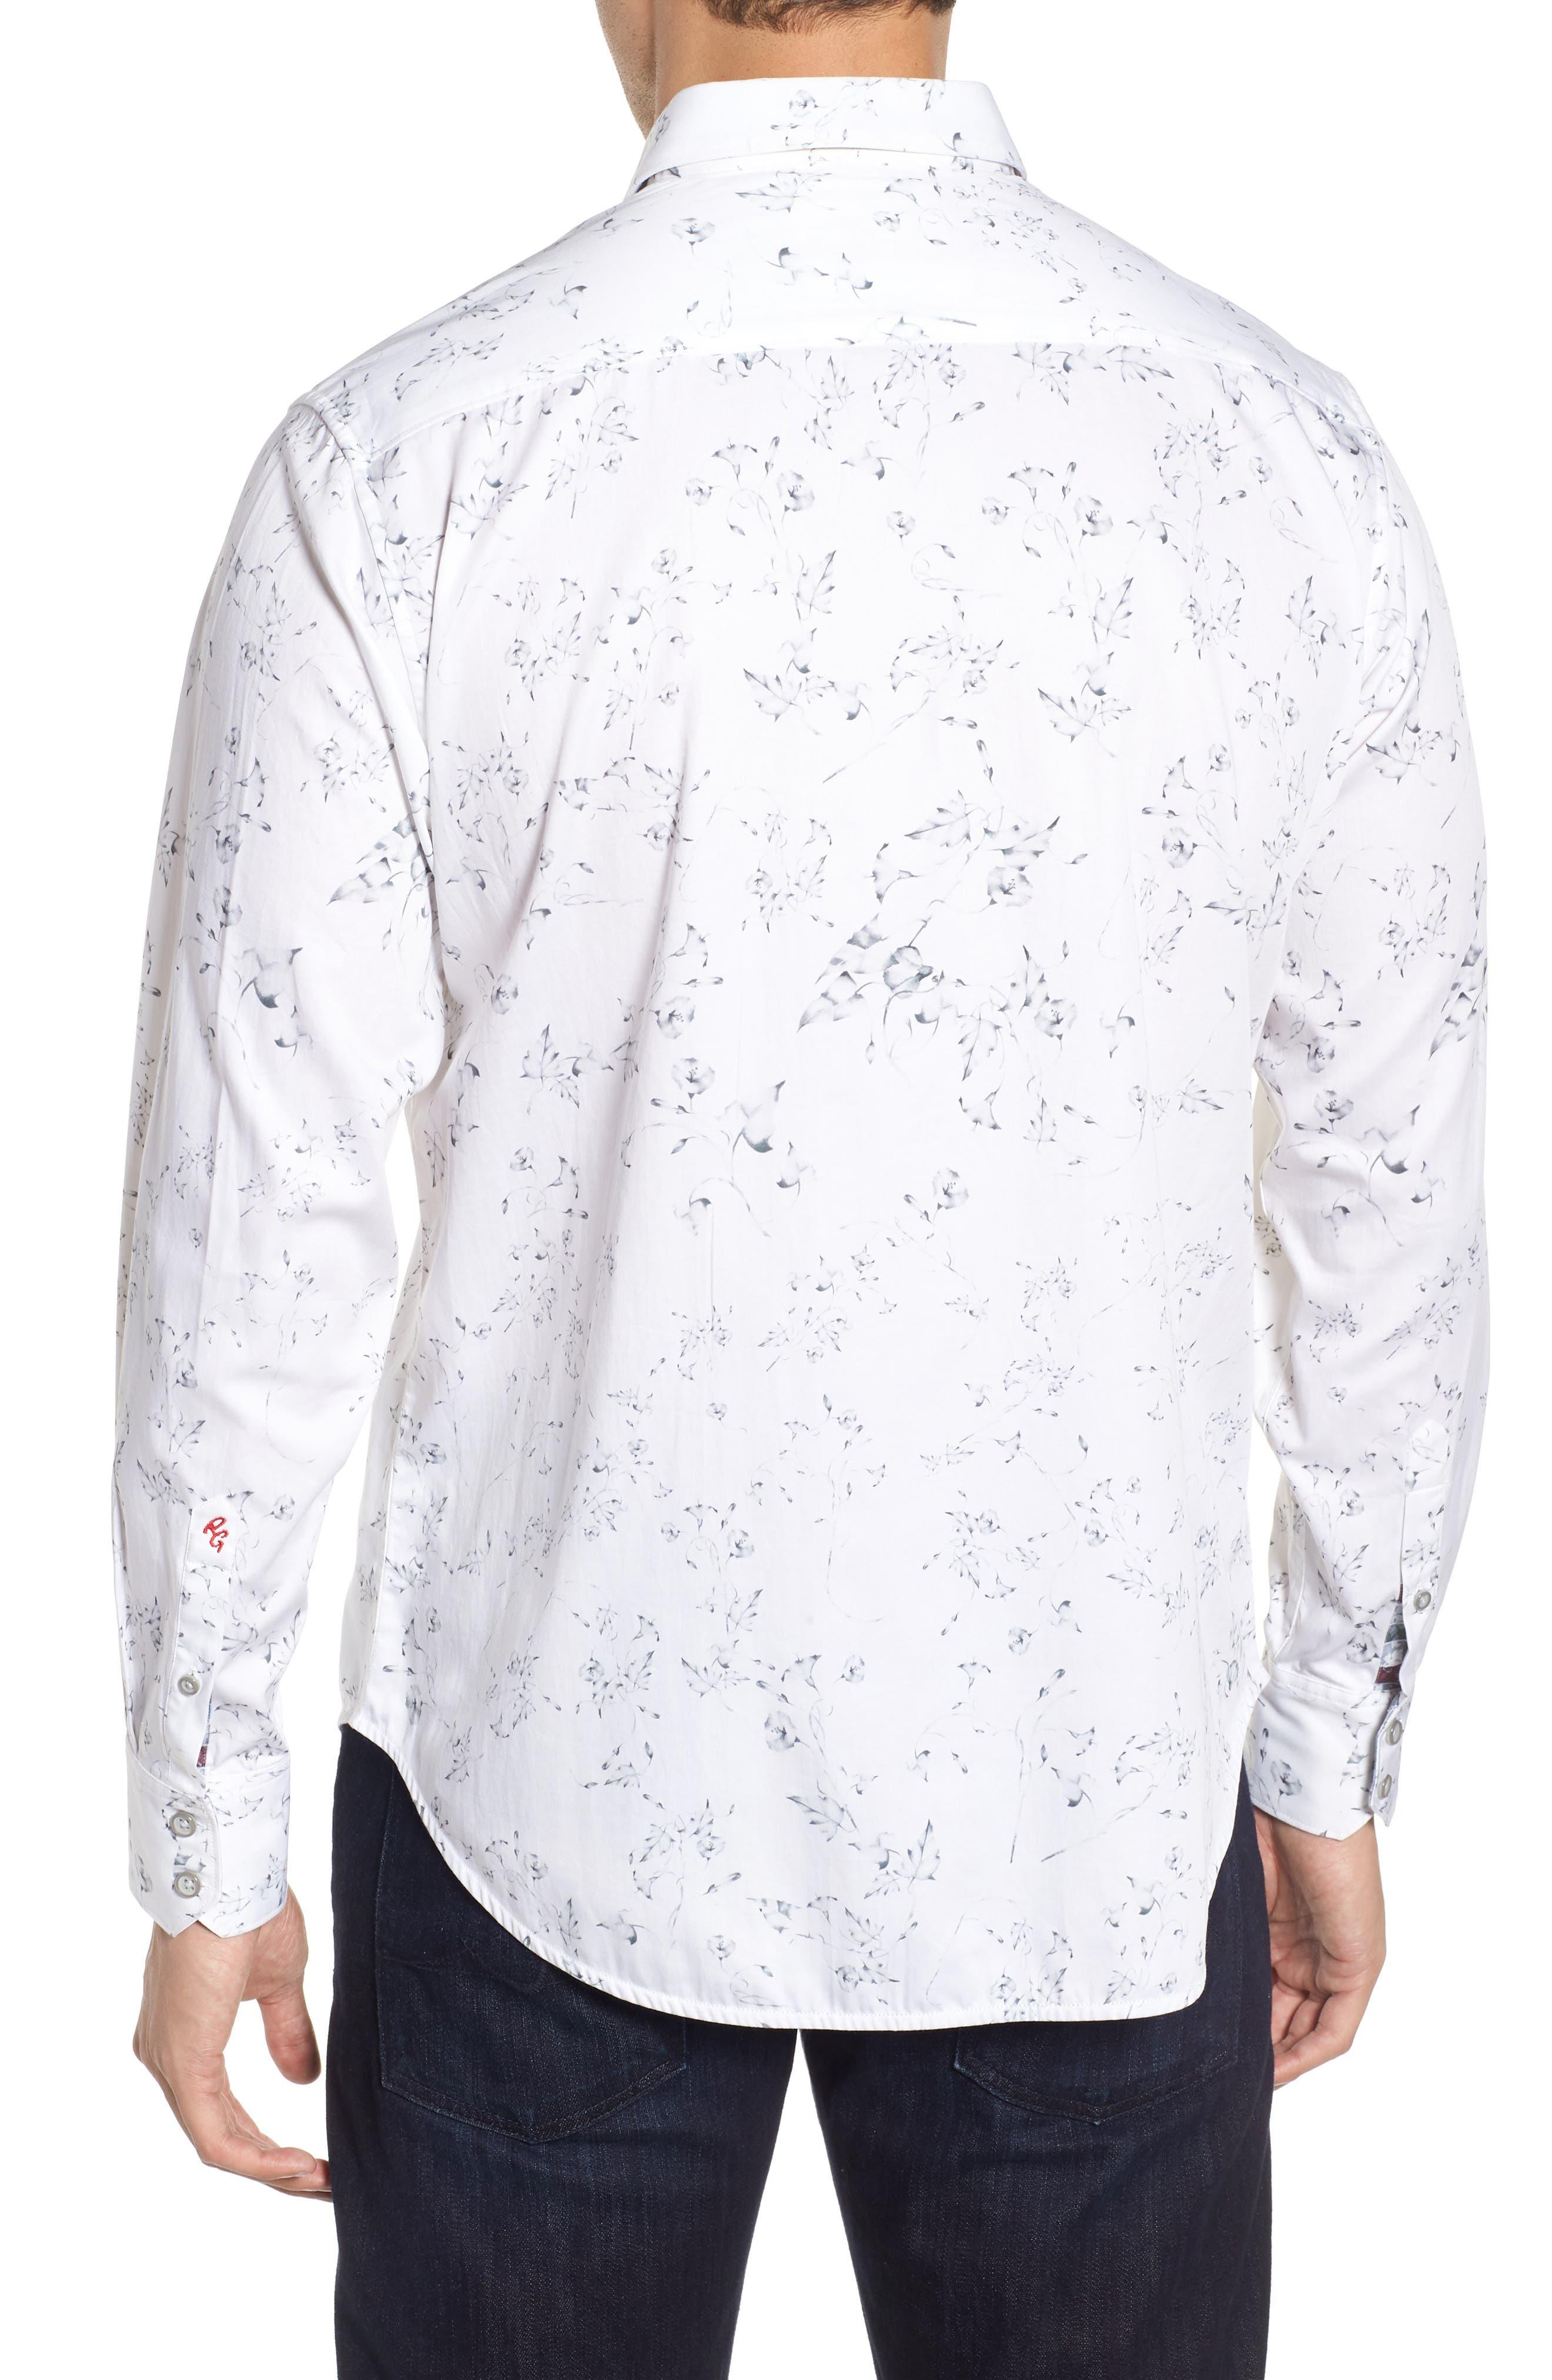 De La Cruz Classic Fit Sport Shirt,                             Alternate thumbnail 2, color,                             100